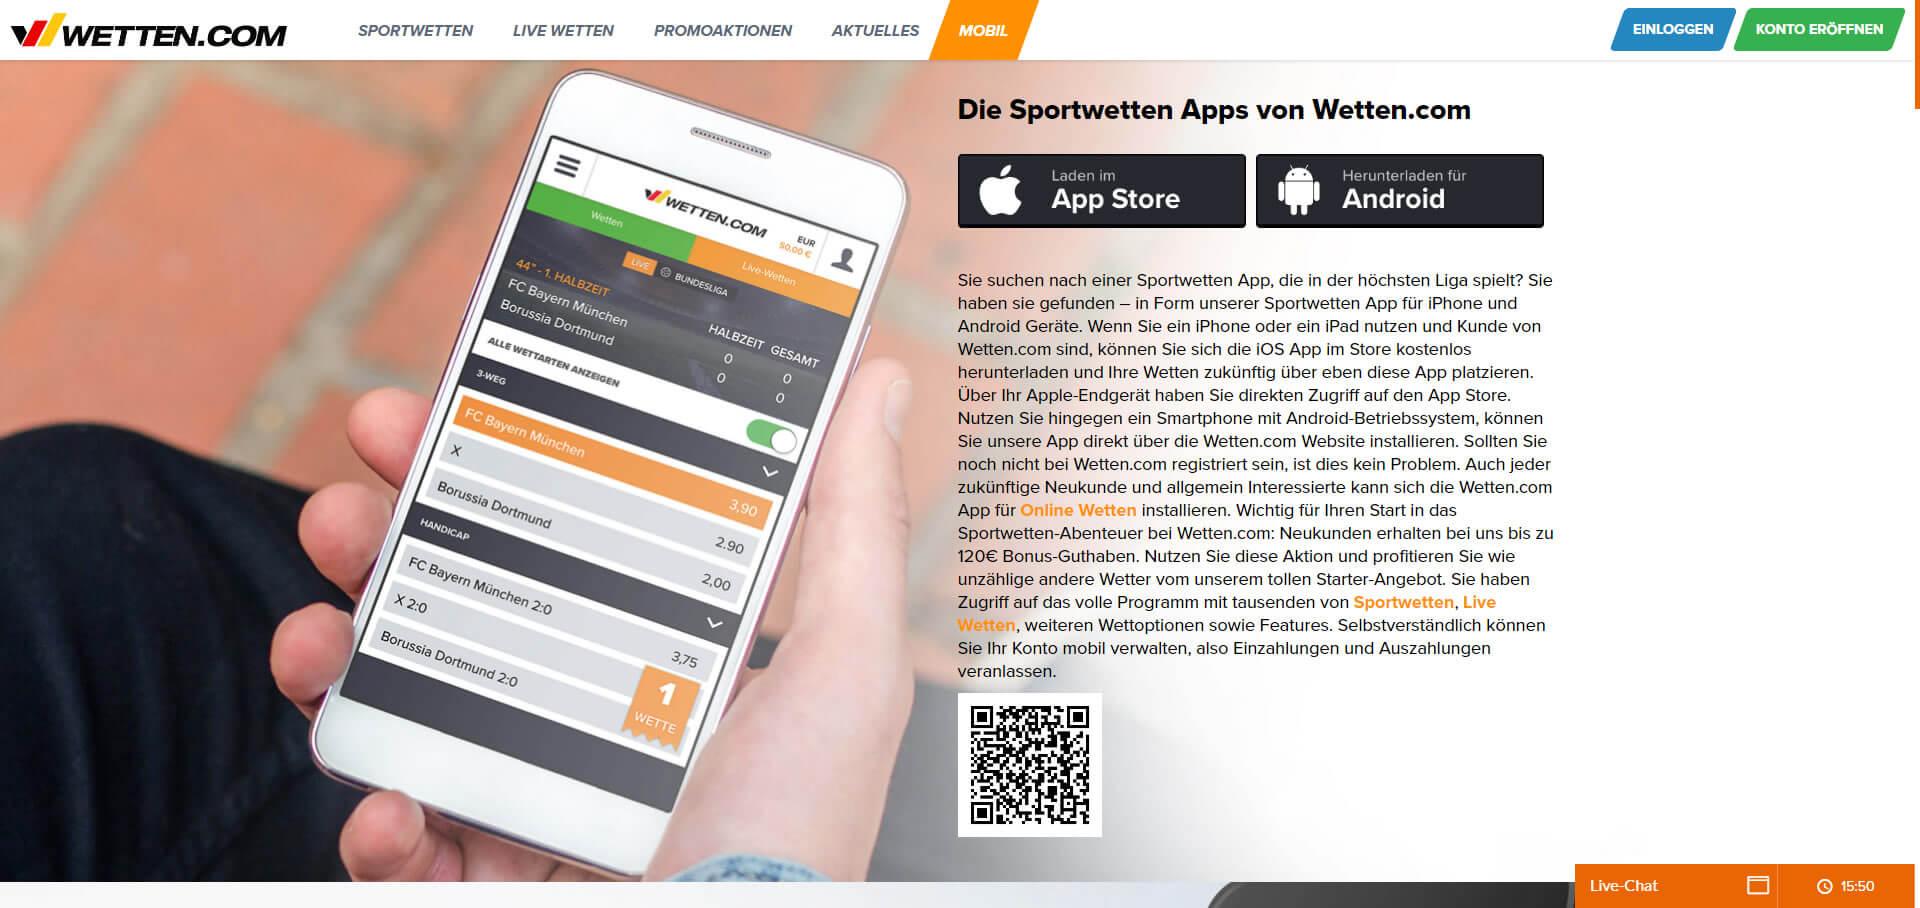 wettencom app